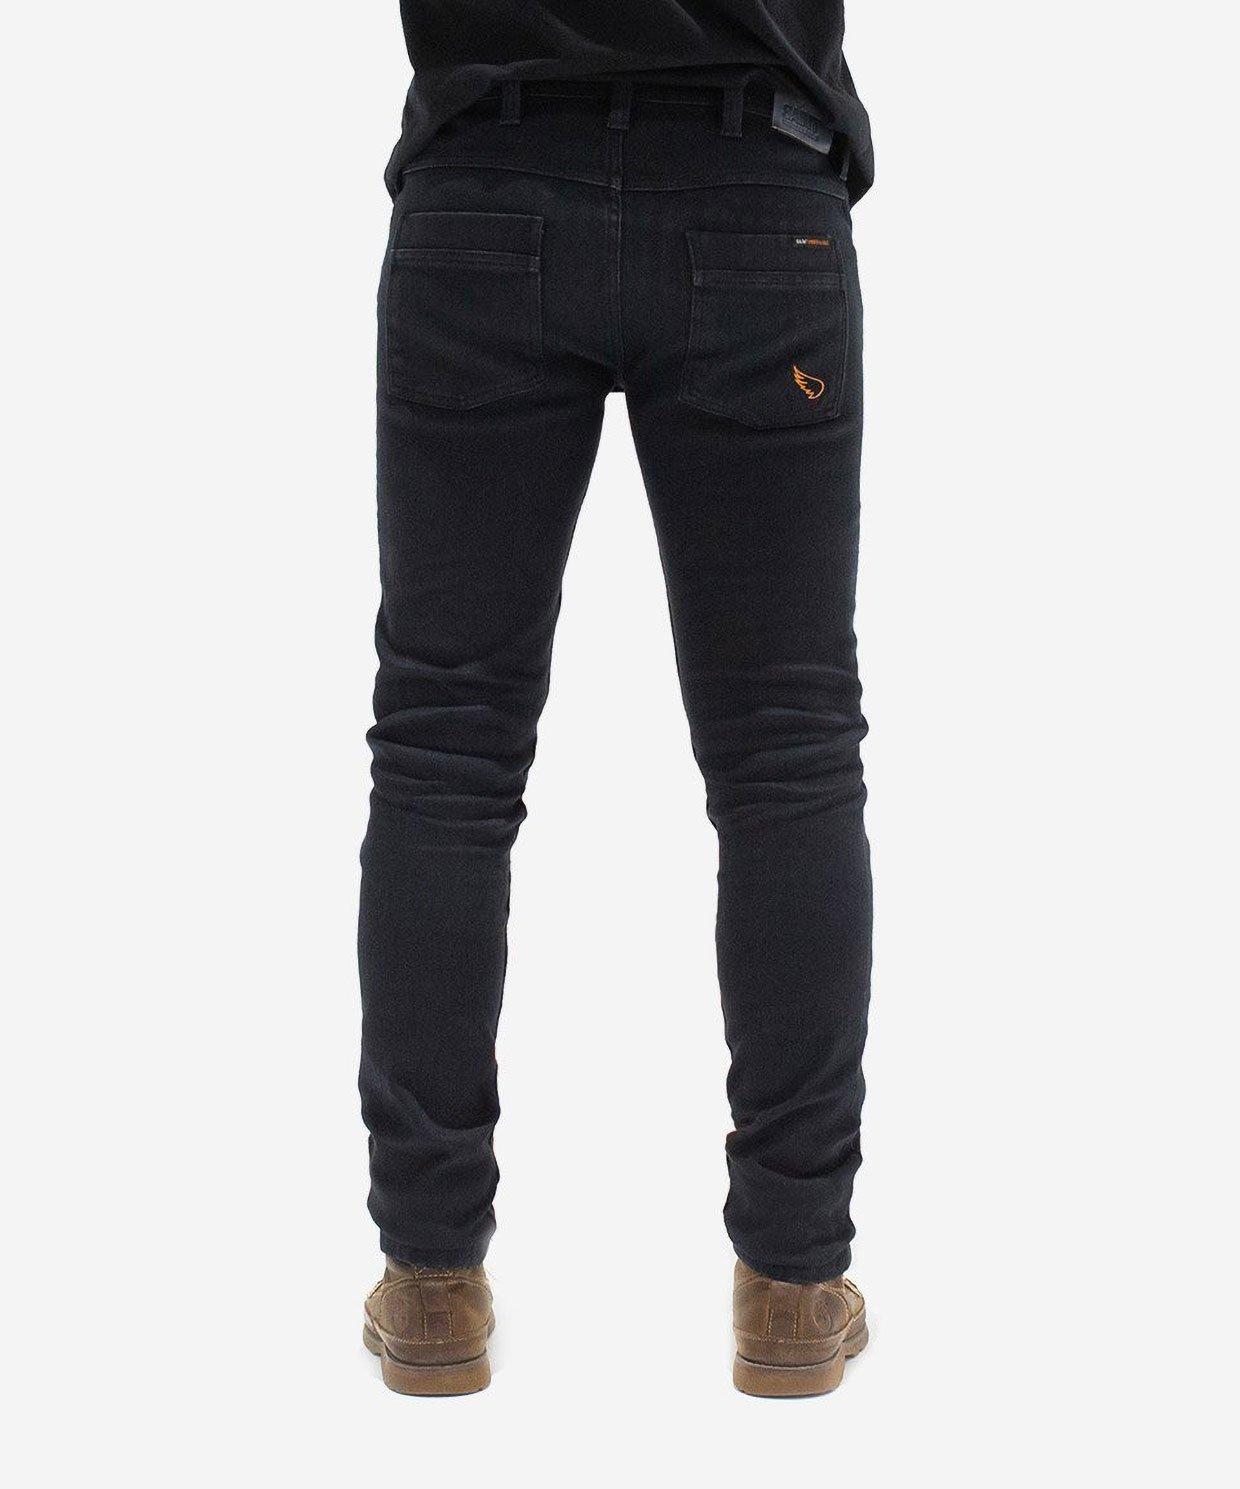 SA1NT Unbreakable Denim Jeans